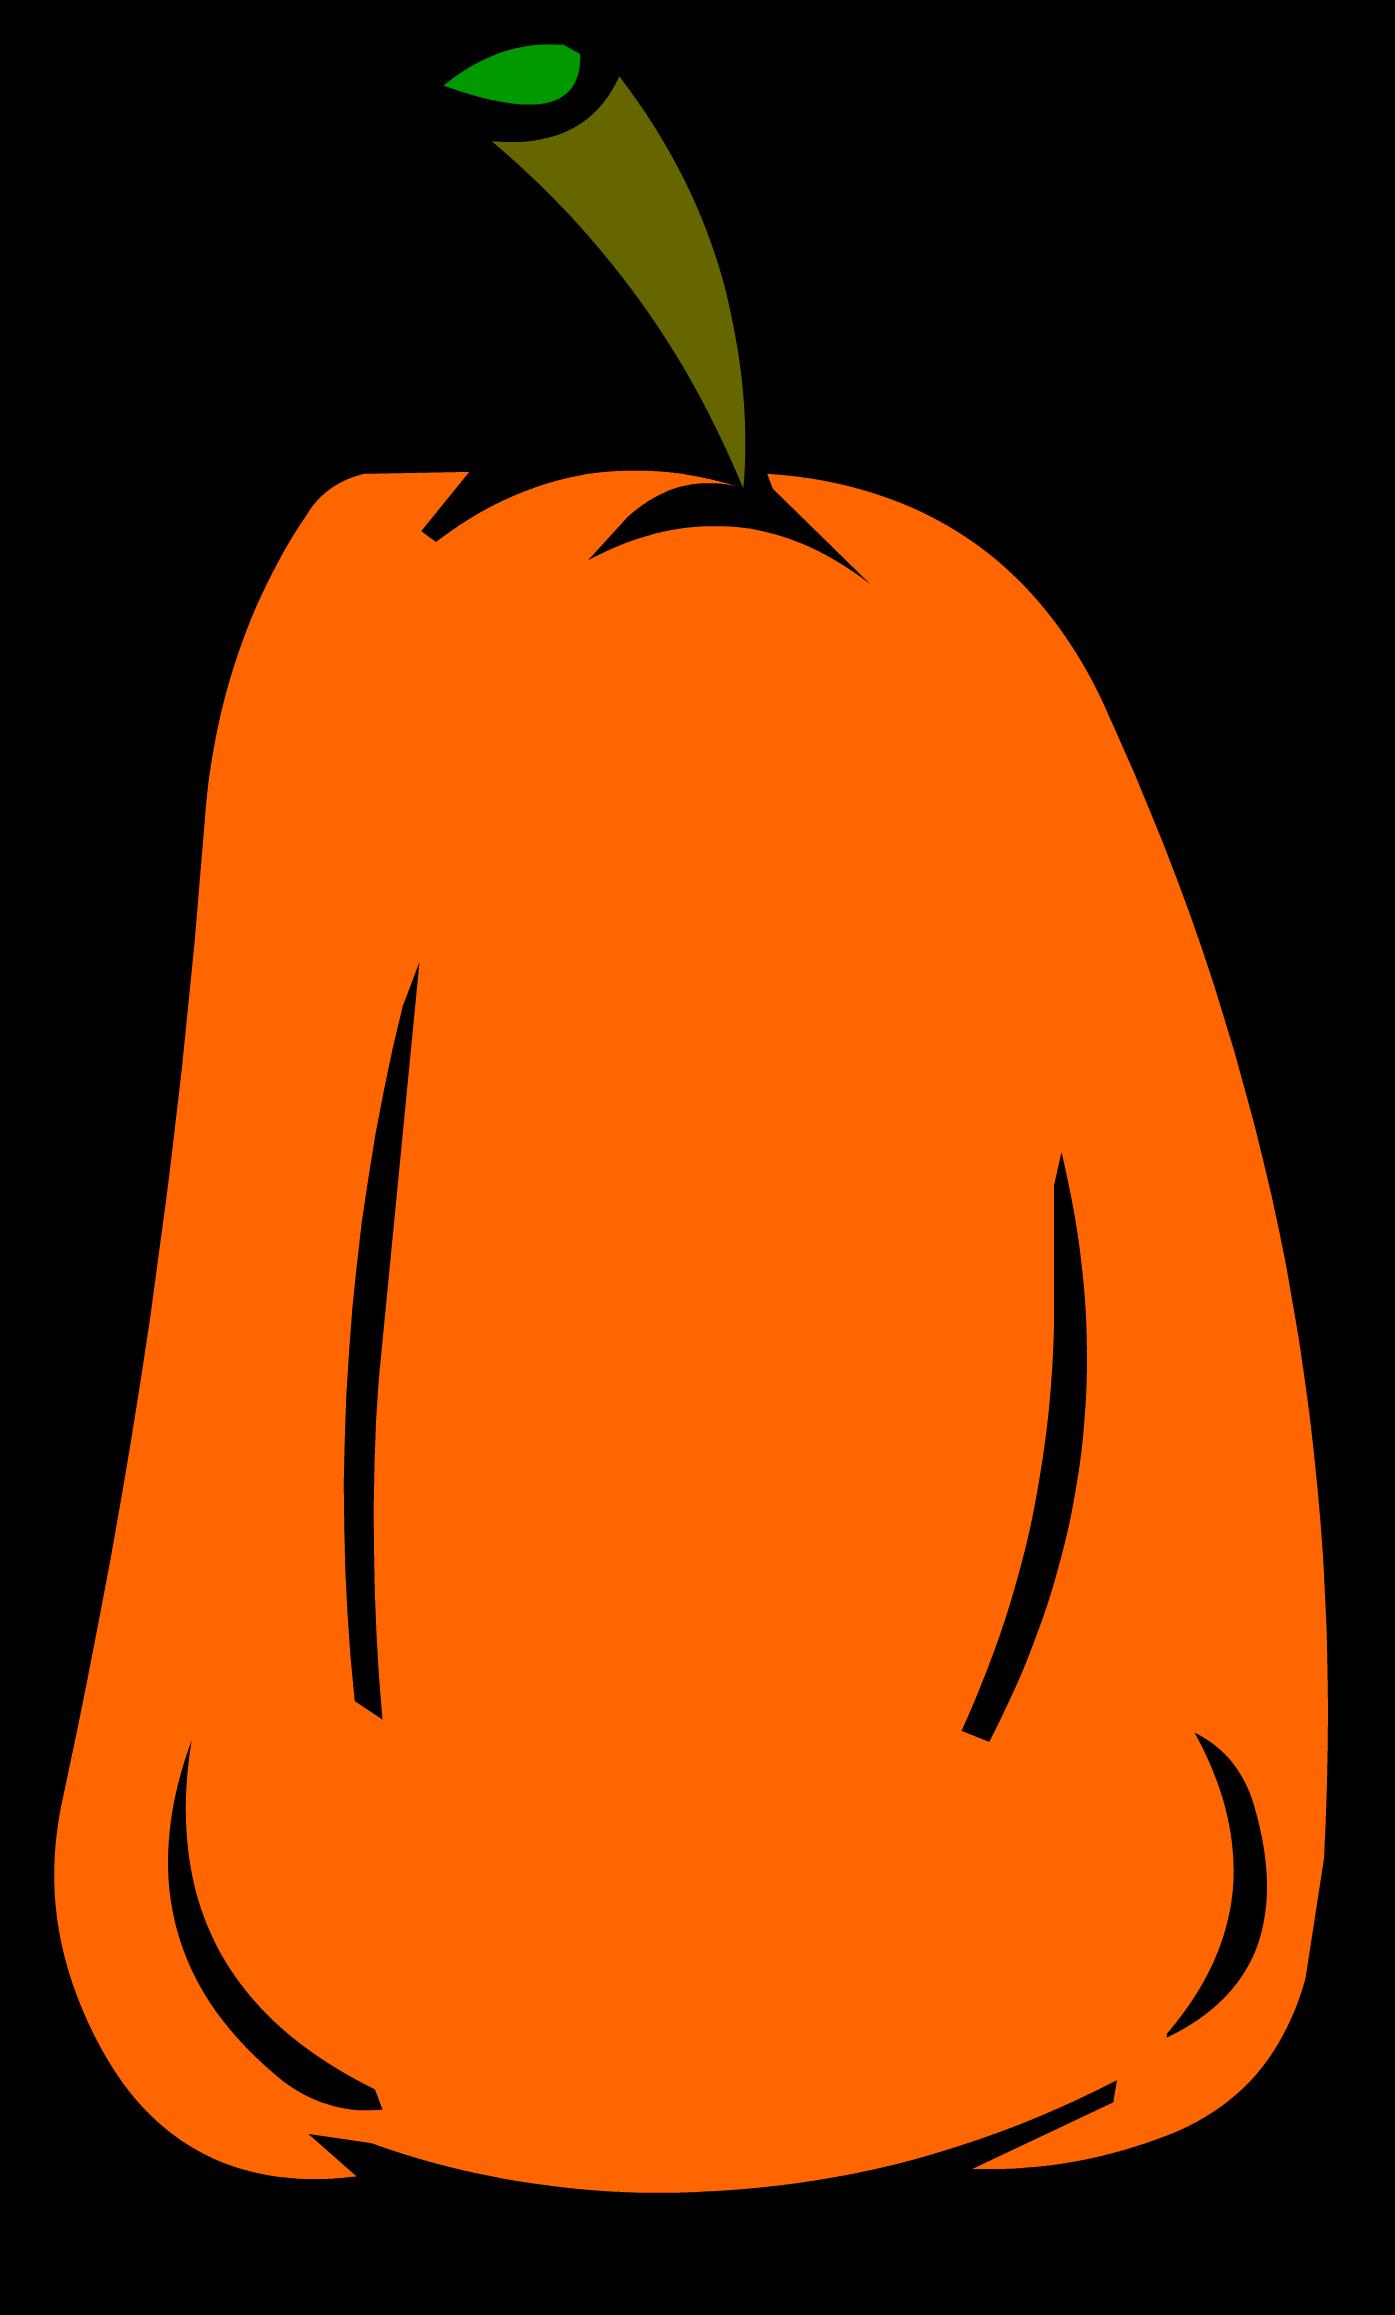 Pumpkin clipart jack o lantern sprite picture free stock Image - Goofy Jack-O-Lantern sprite 005.png | Club Penguin Wiki ... picture free stock